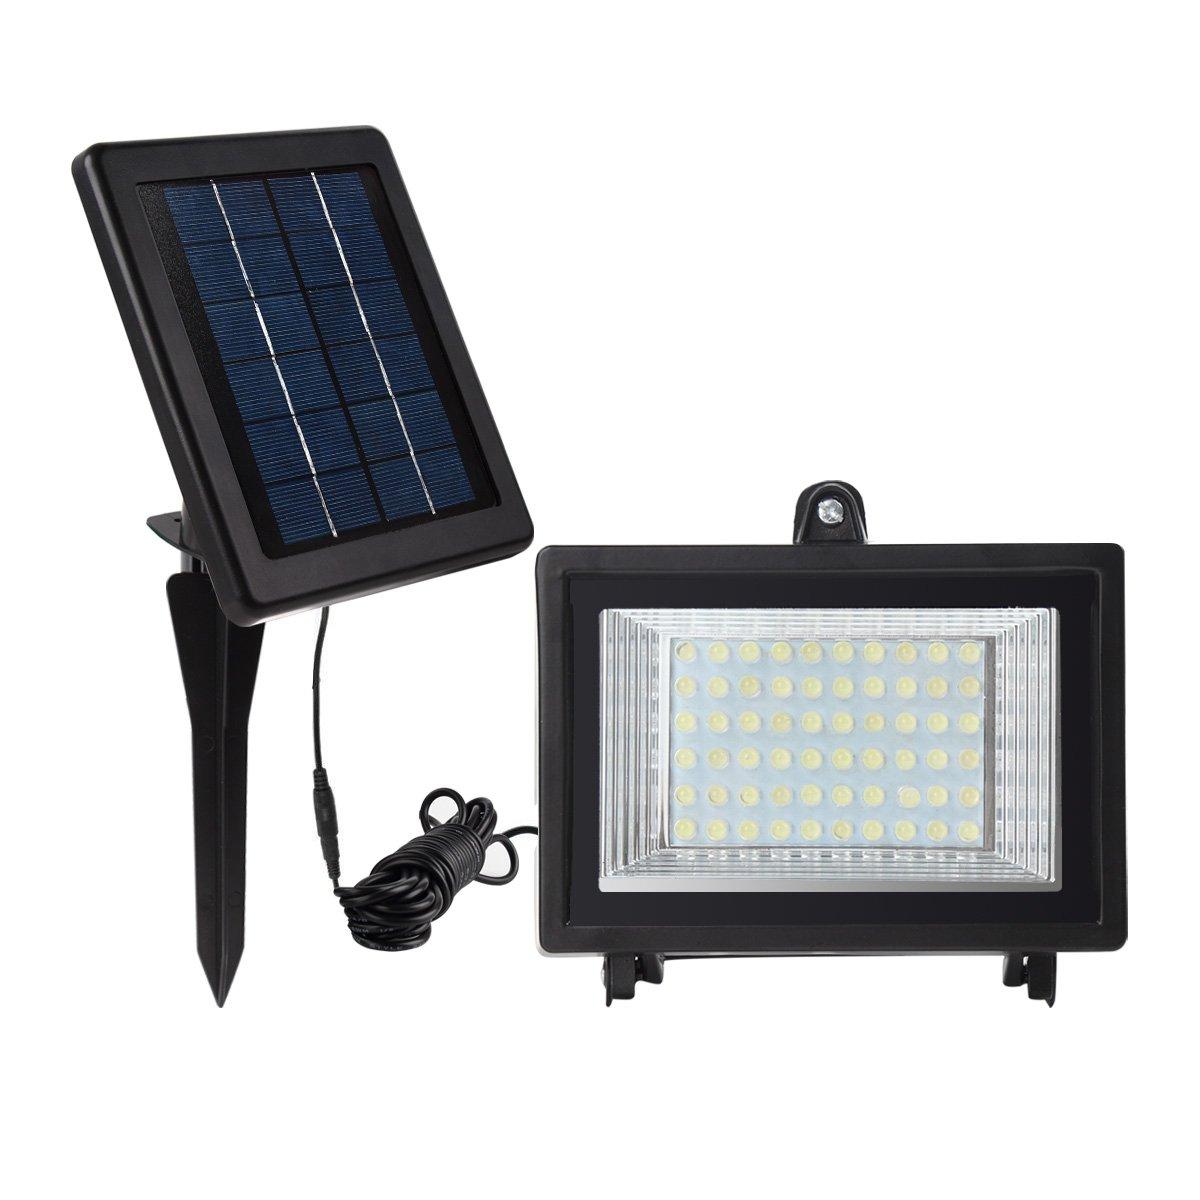 Meikee 60 leds luz solar exterior 300lm jard n de luces for Iluminacion solar de jardin